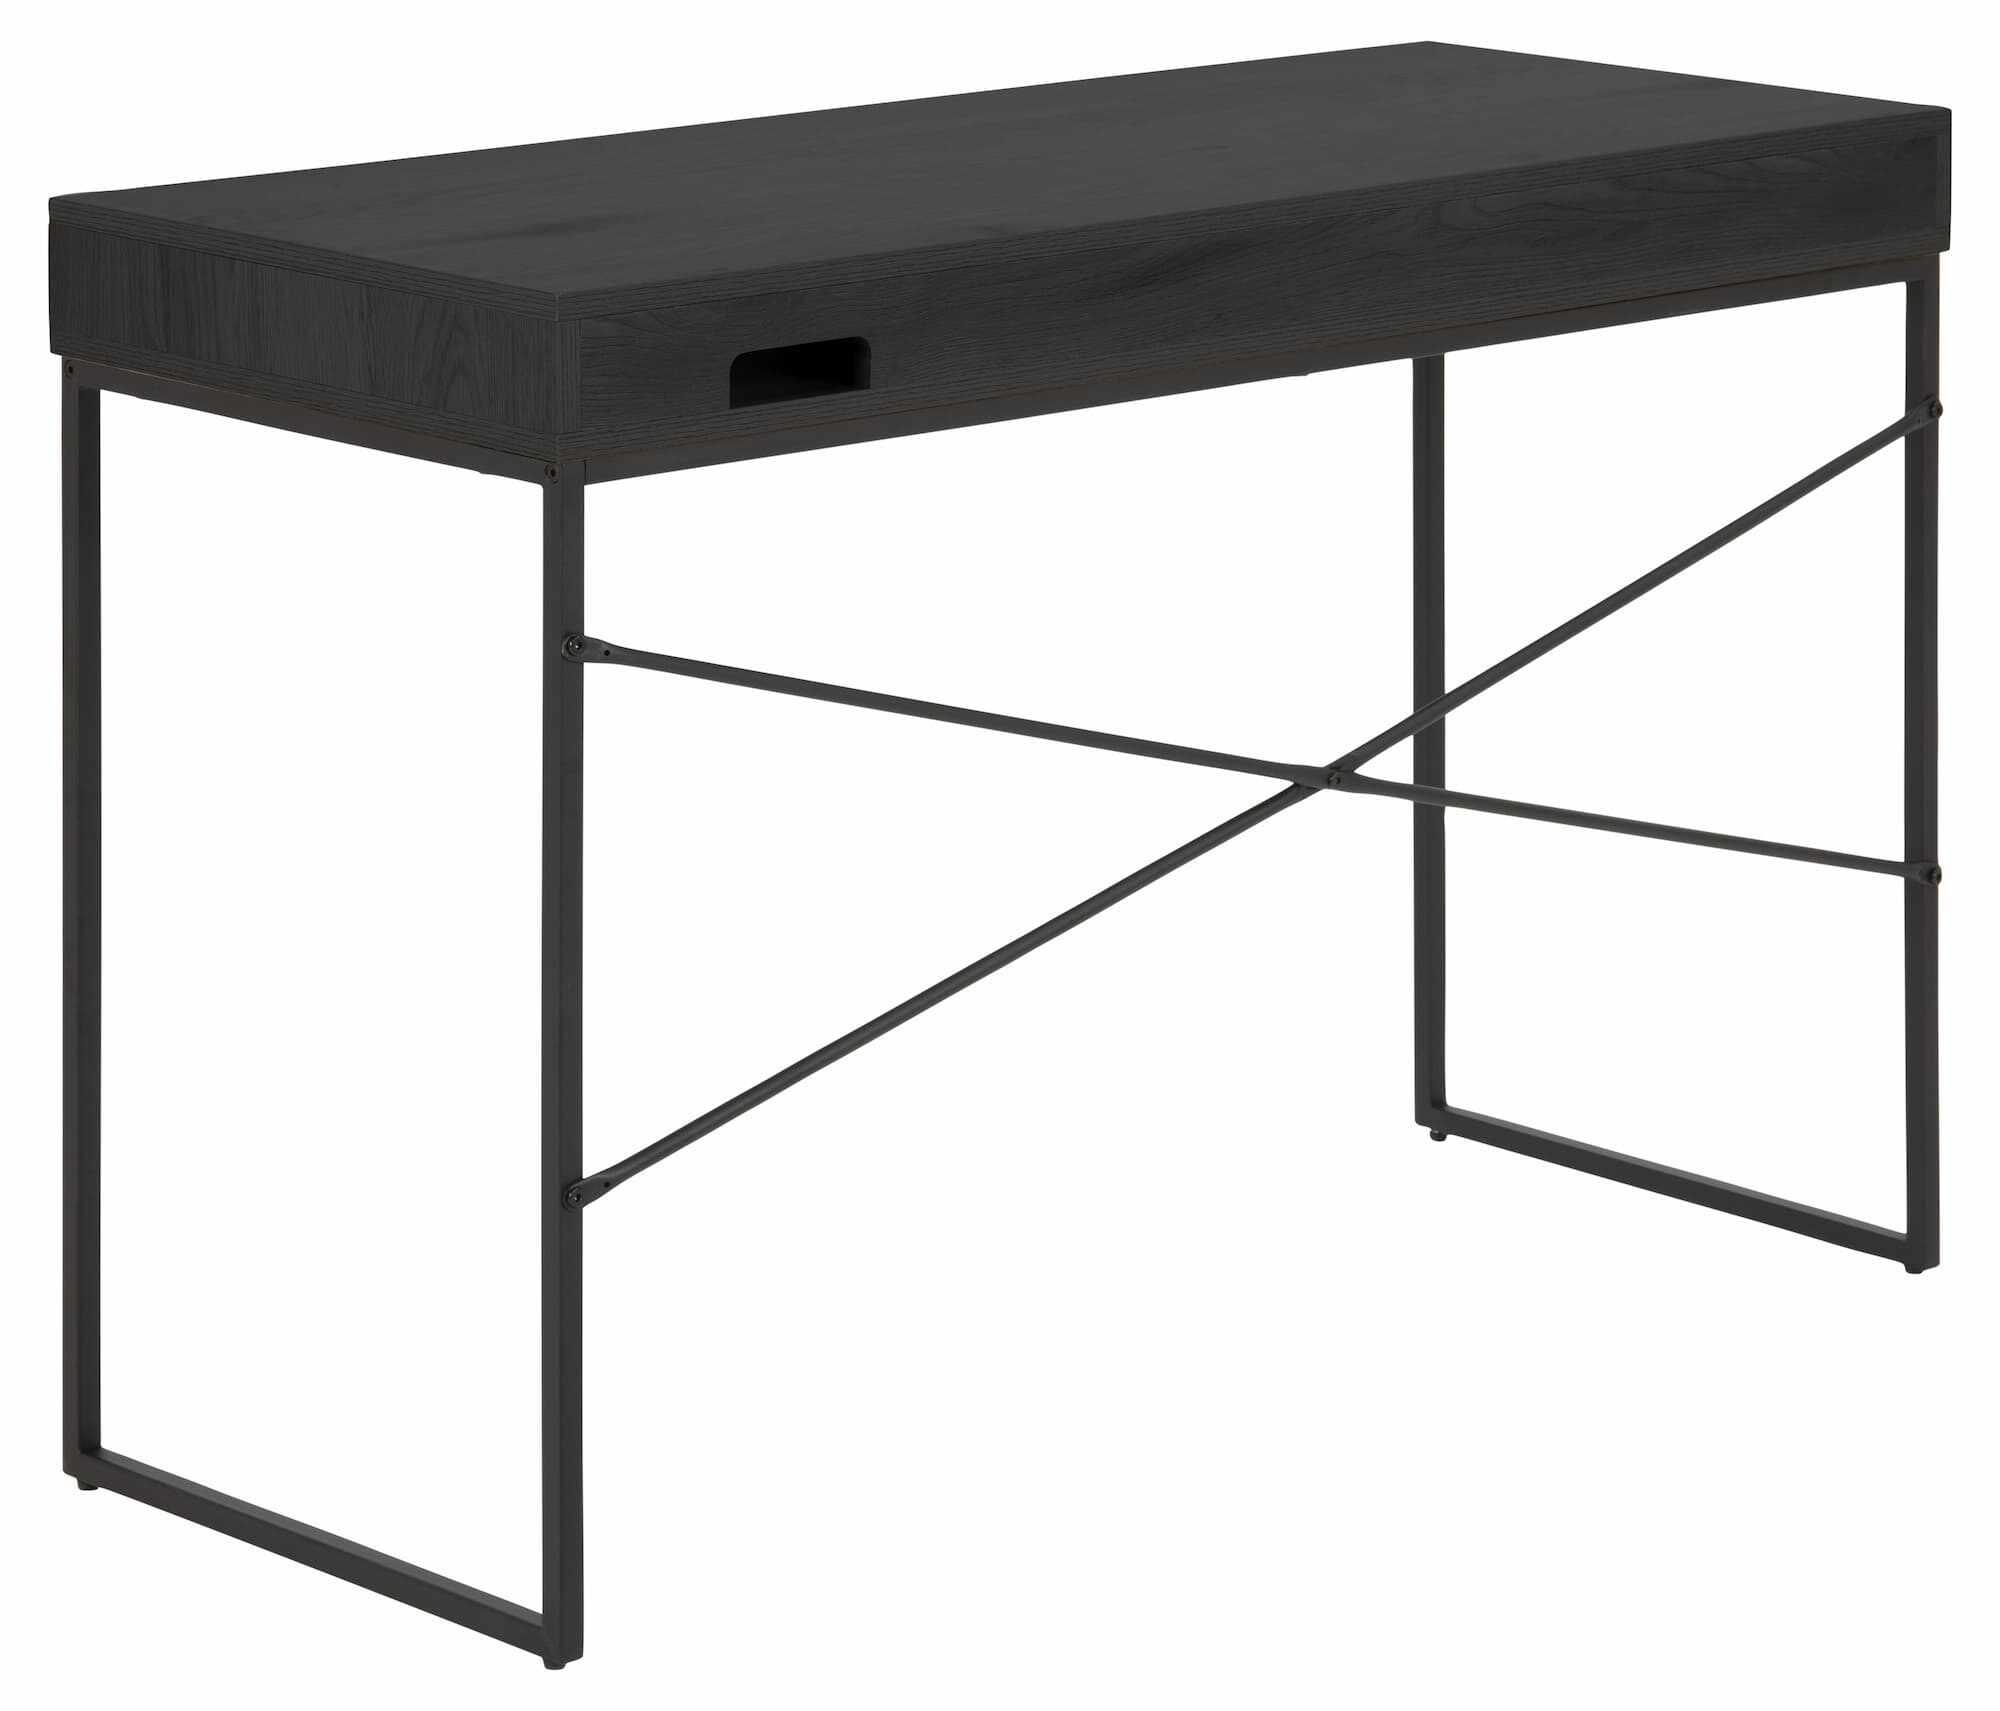 Masa de birou din pal si metal cu 1 sertar Seaford Grafit / Negru, L110xl45xH75 cm la pret 580 lei